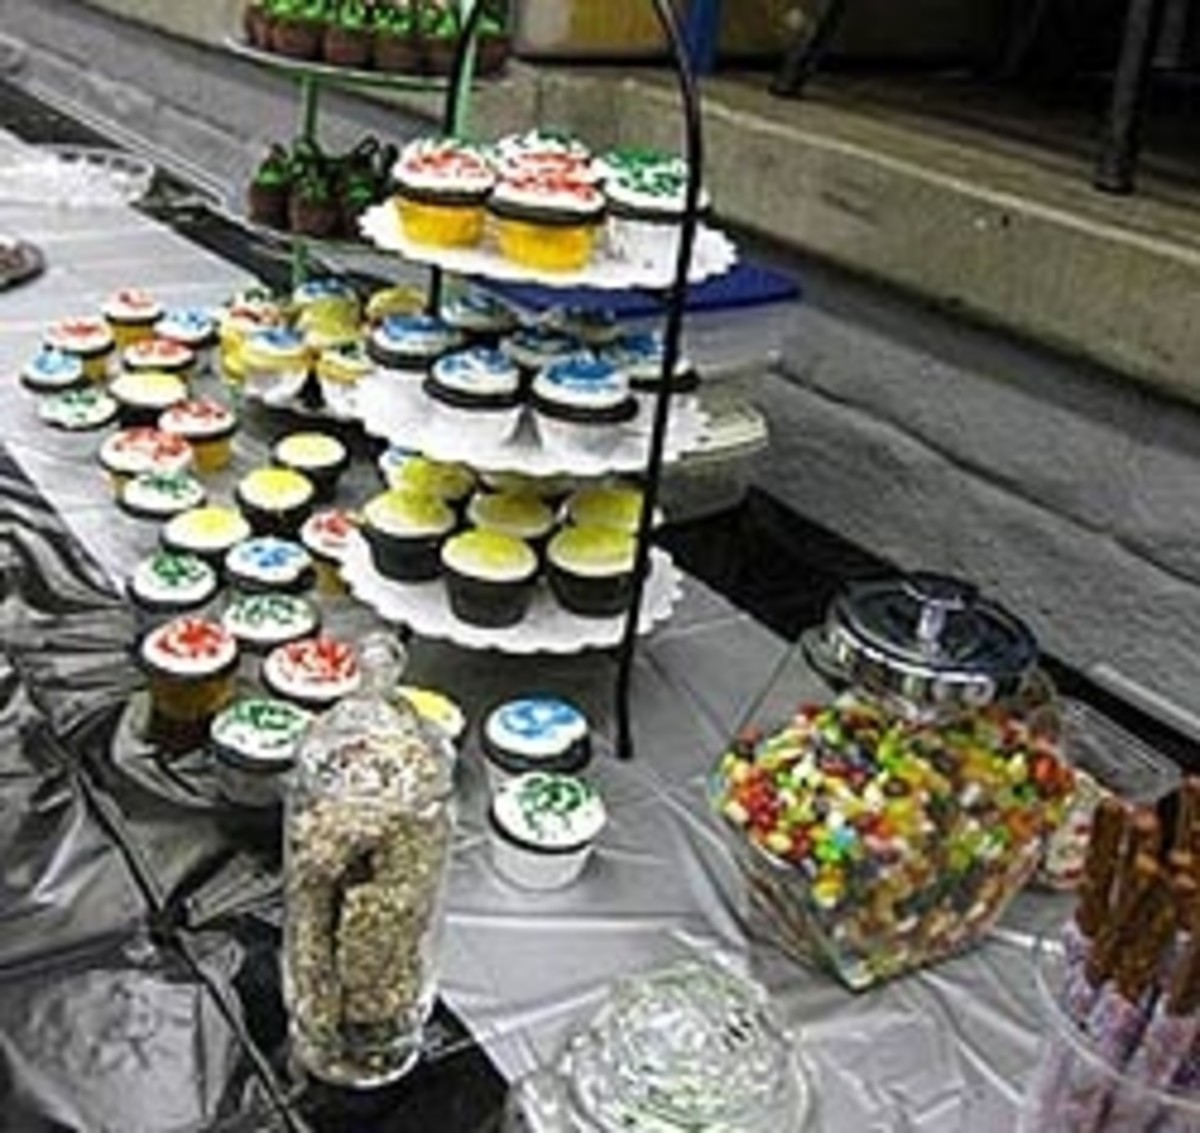 Harry Potter Recipes: Sweets, Treats, Drinks, & More